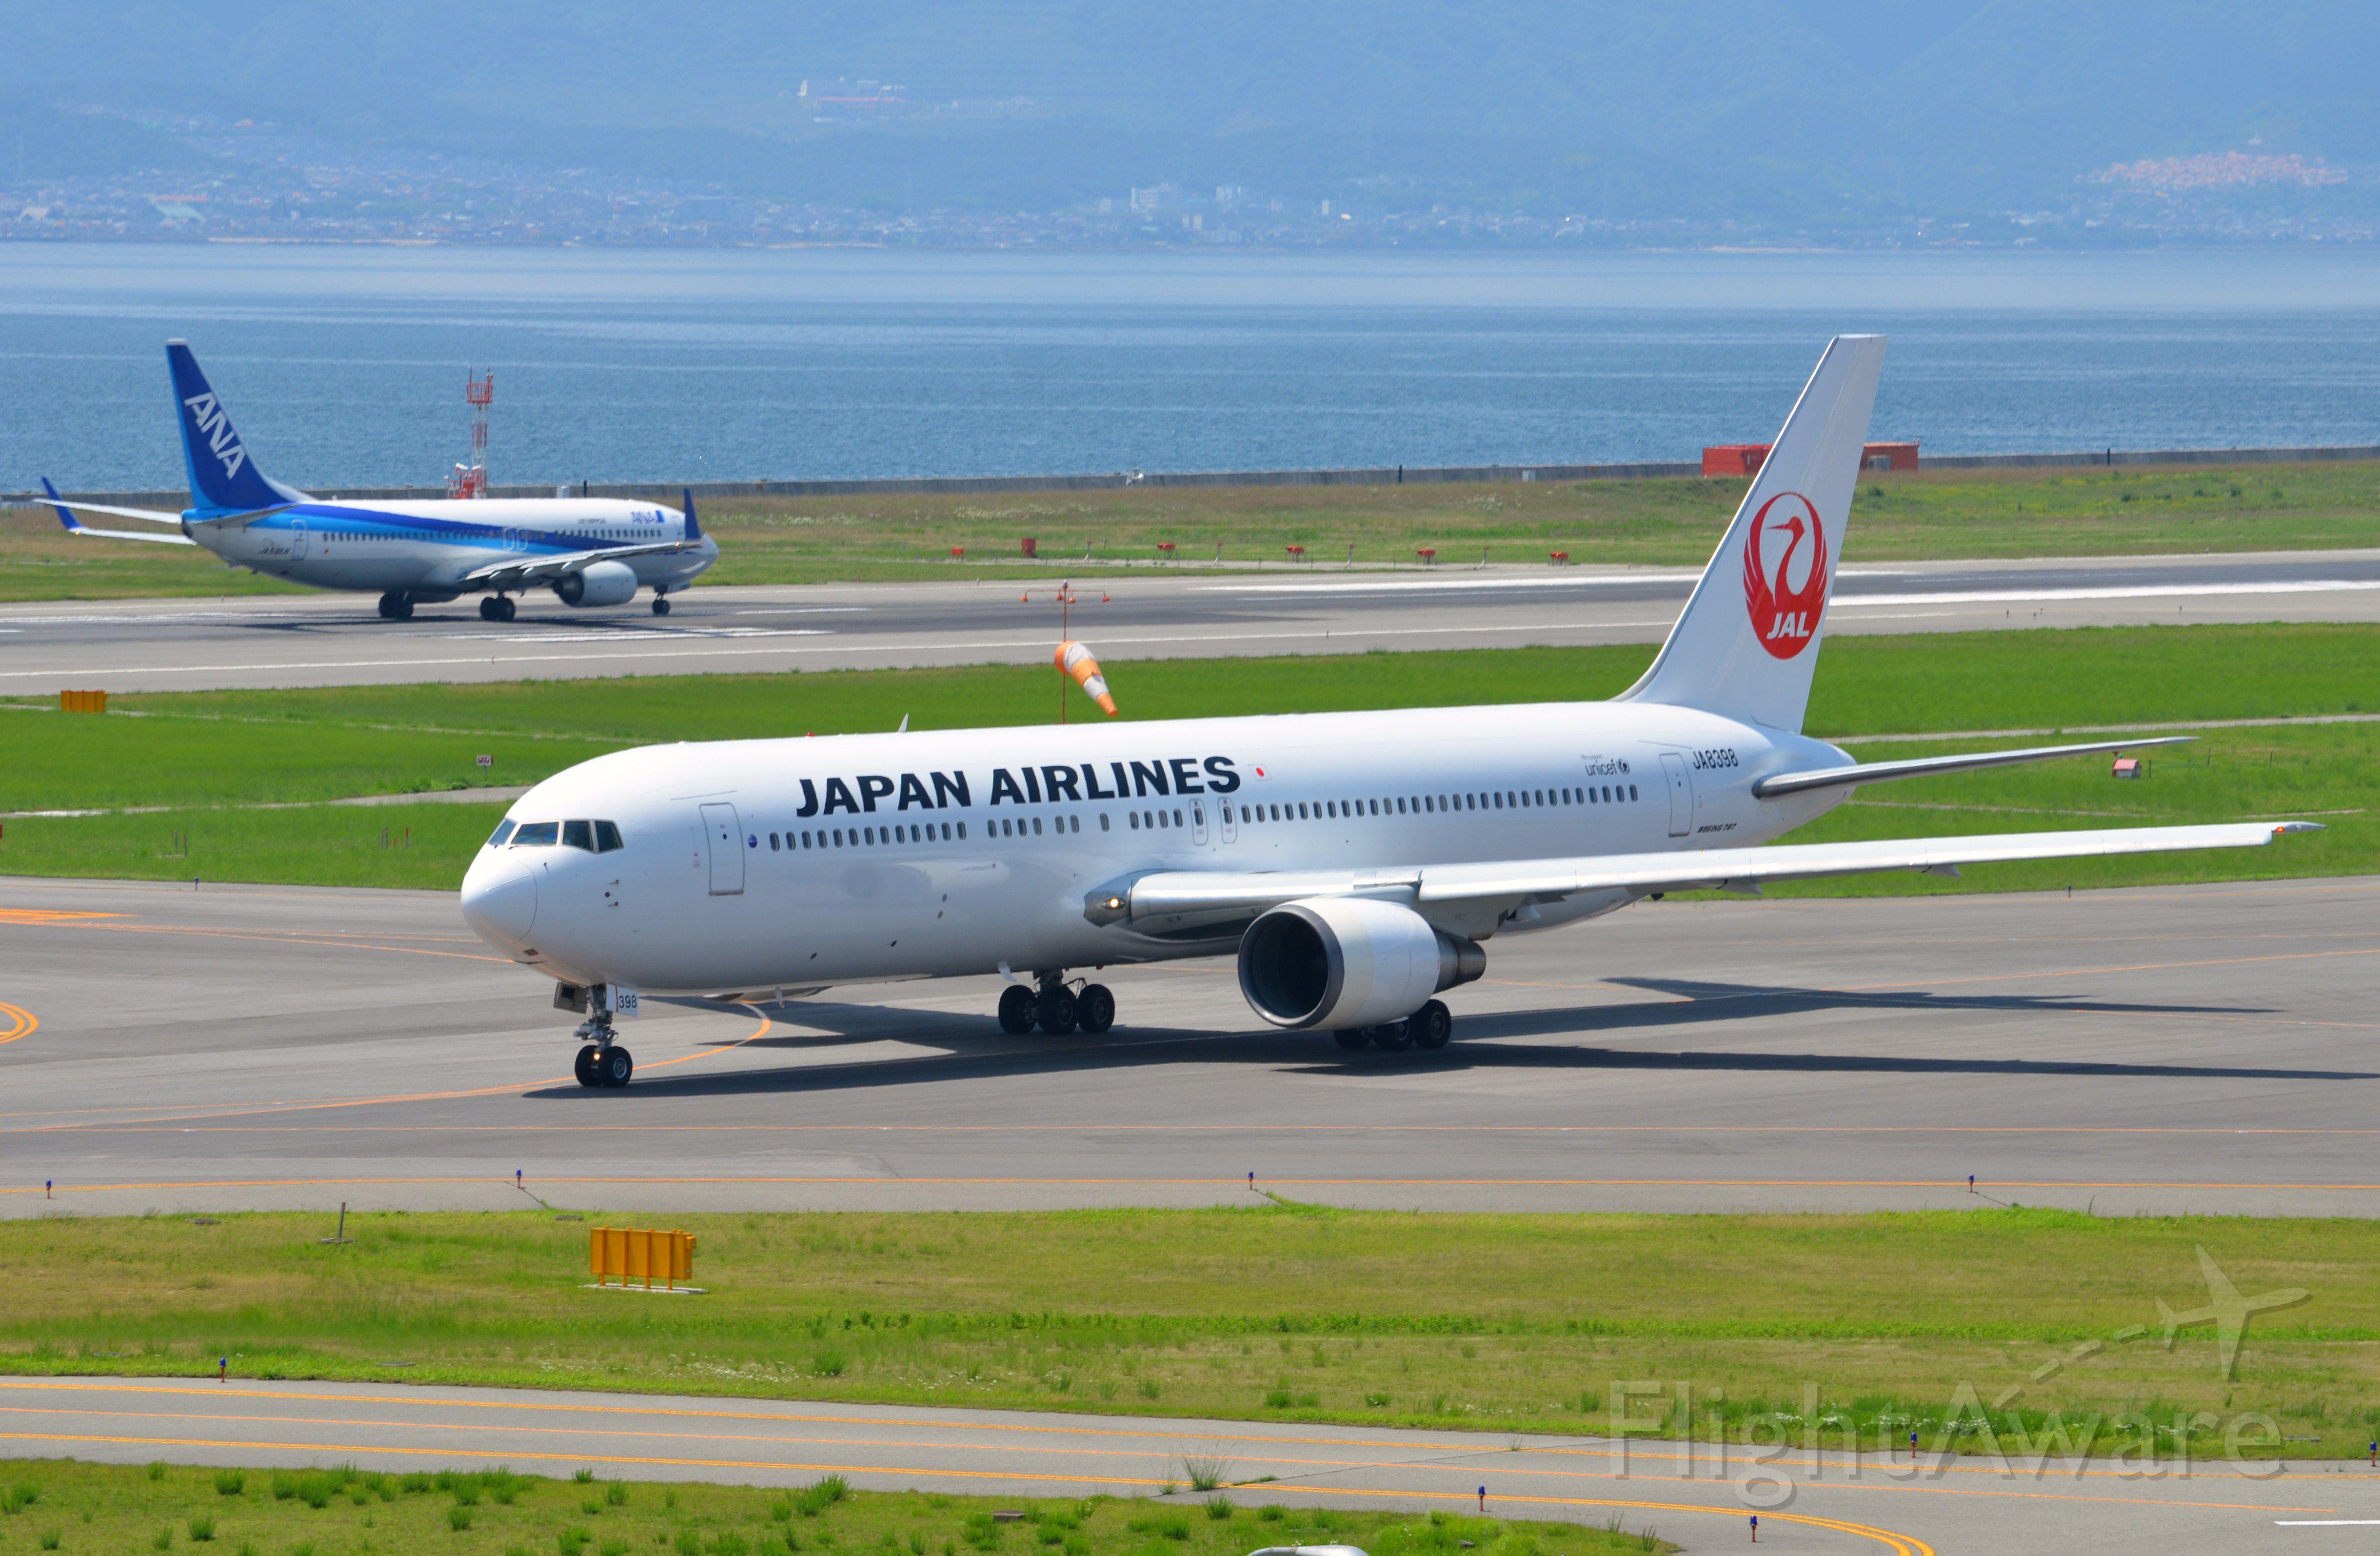 BOEING 767-300 (JA8398) - Airline: Japan Airlines (JL/JAL); Airport: Kansai International Airport (KIX/RJBB); Camera: Nikon D7000; Date: 4 July 2012